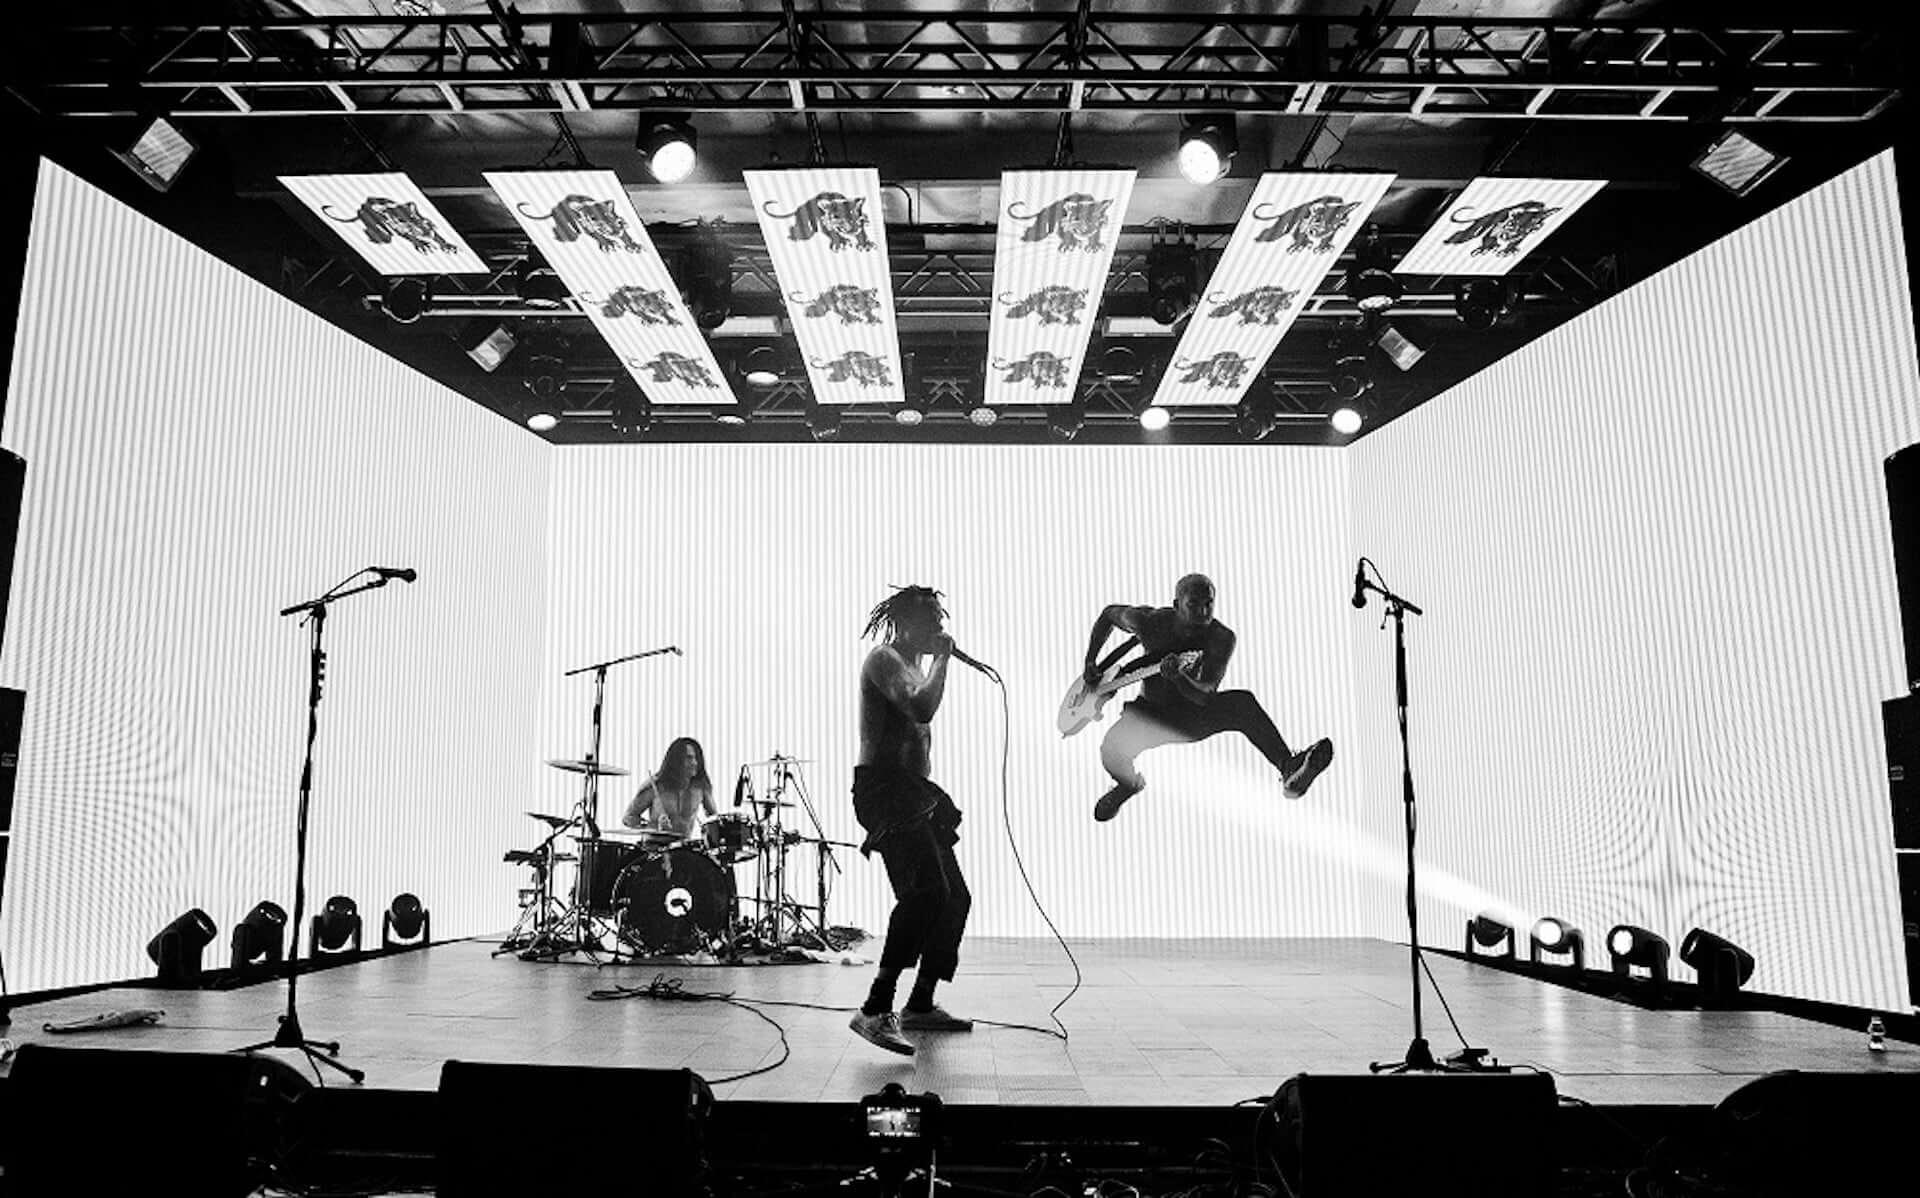 <FUJI ROCK FESTIVAL 2018>で初来日を果たしたFEVER 333が日本向けバーチャルライブツアーを明日開催!最新EPも配信中 music201026_fever333_6-1920x1198